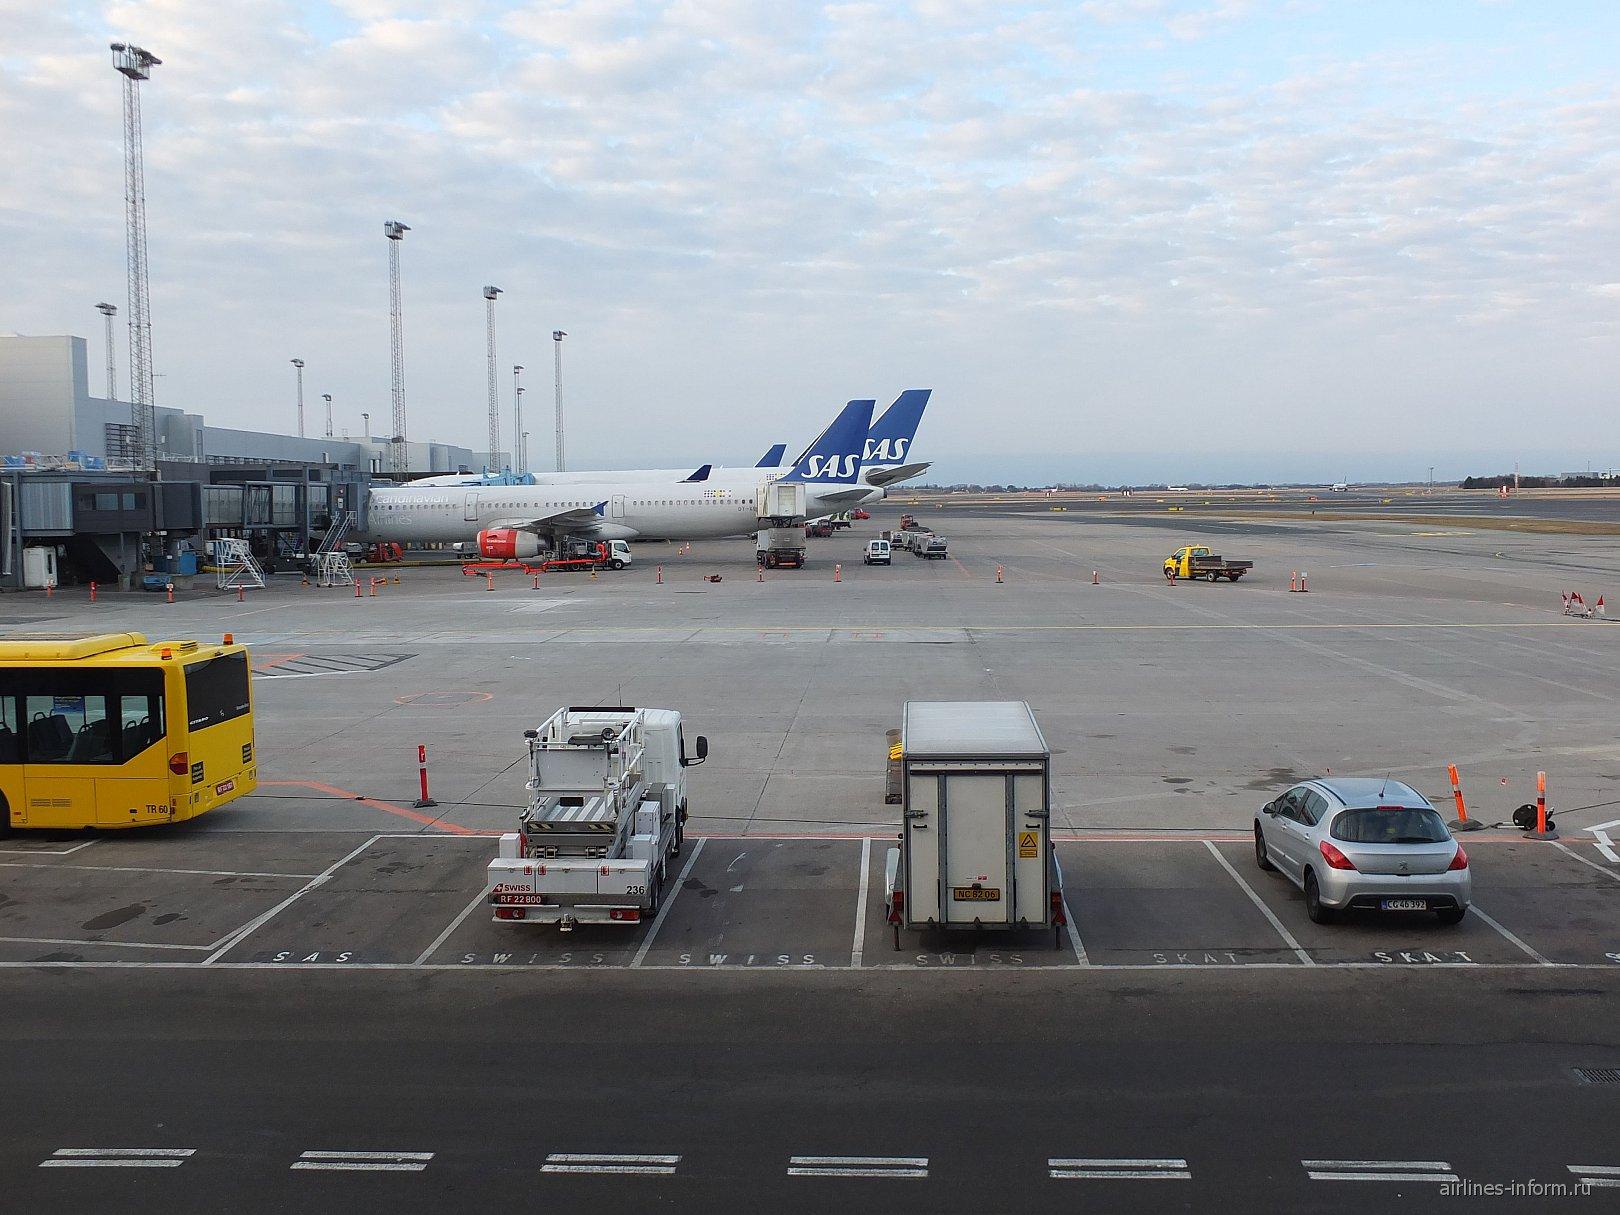 Перрон аэропорта Копенгаген Каструп